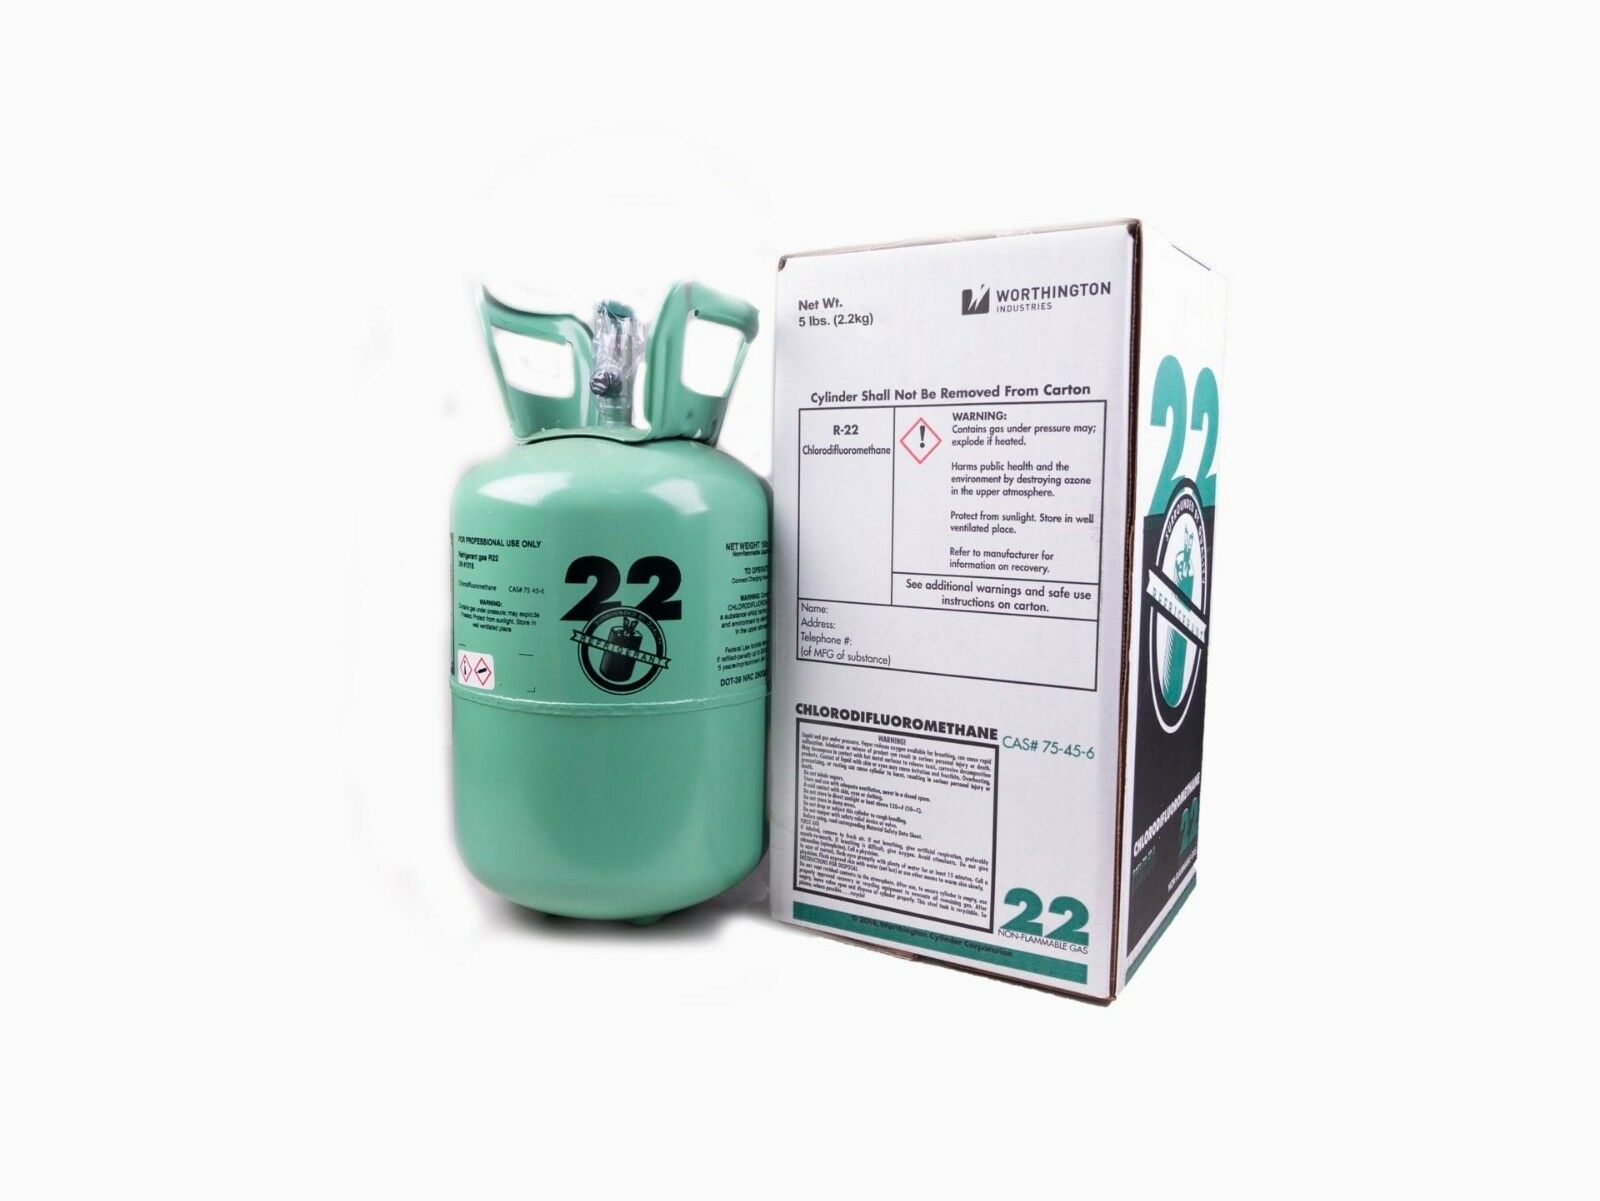 New R22 Virgin Refrigerant FACTORY SEALED 5 LBFREE SAME DAY SHIPPING